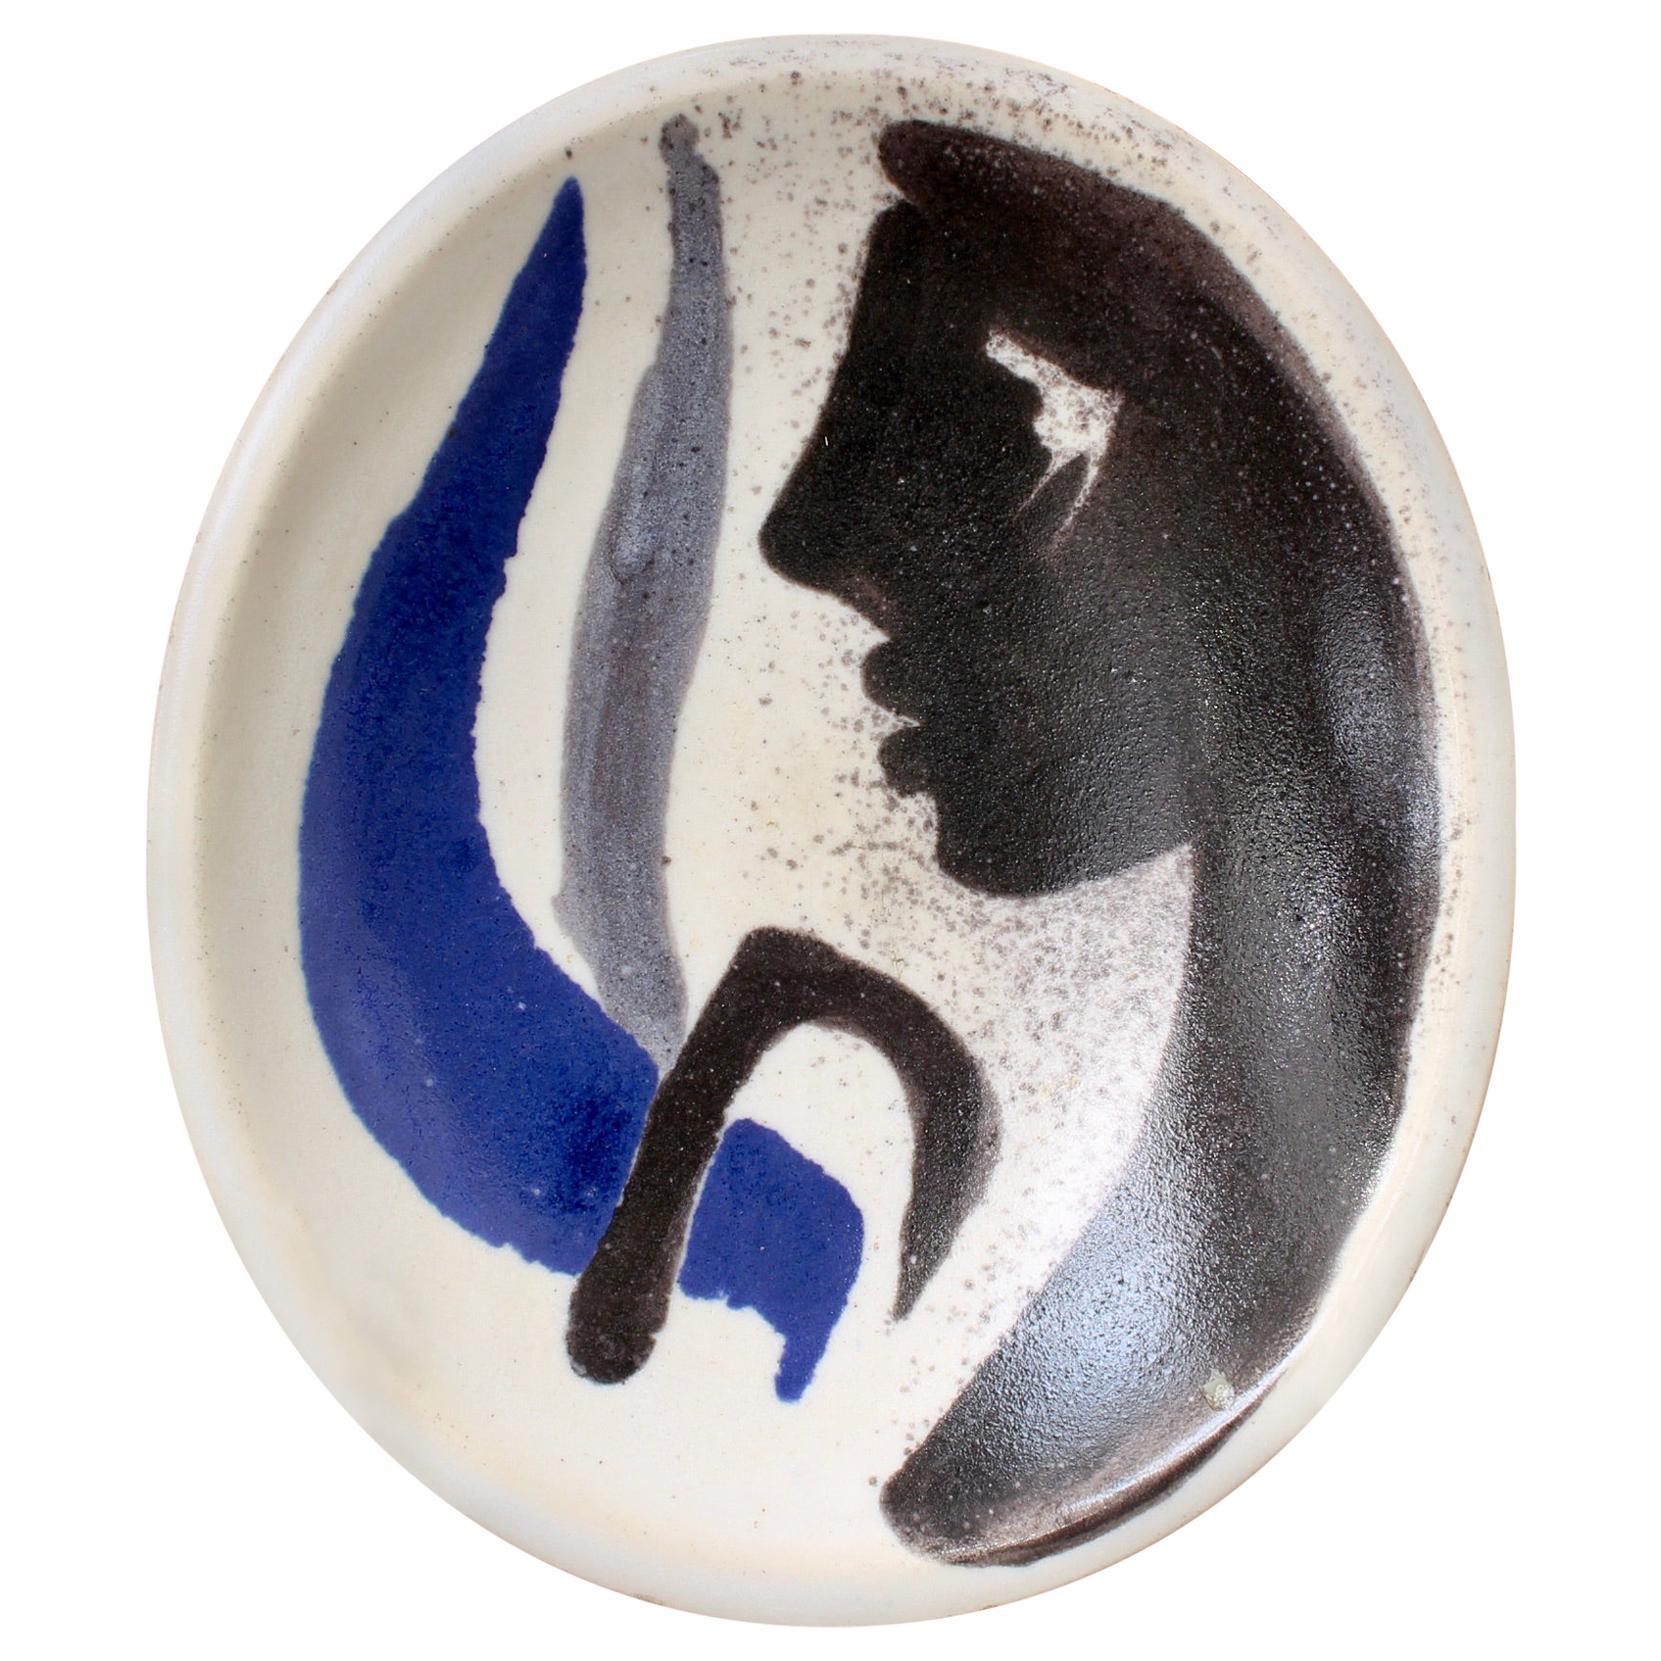 Decorative French Ceramic Bowl by Mado Jolain 'circa 1950s'